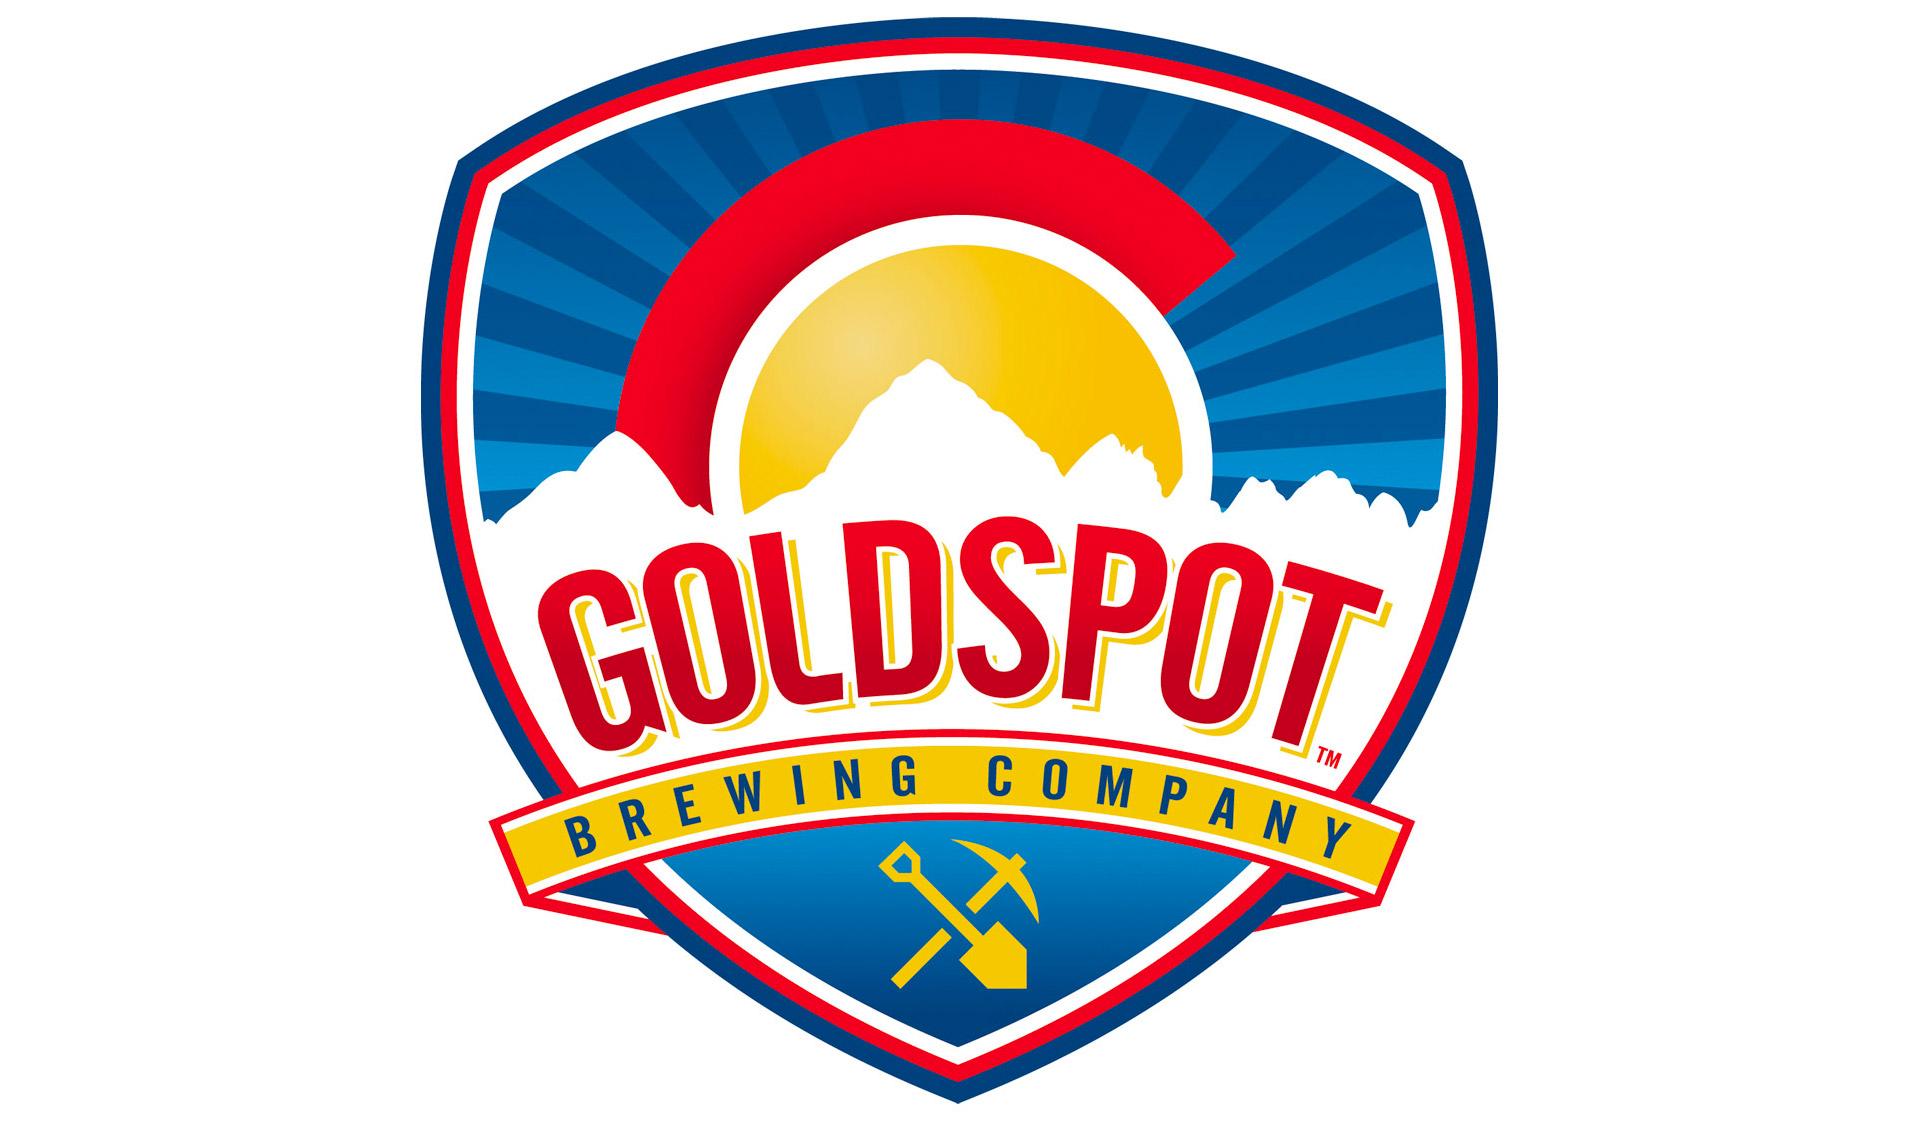 Goldspot Brewing Company Branding